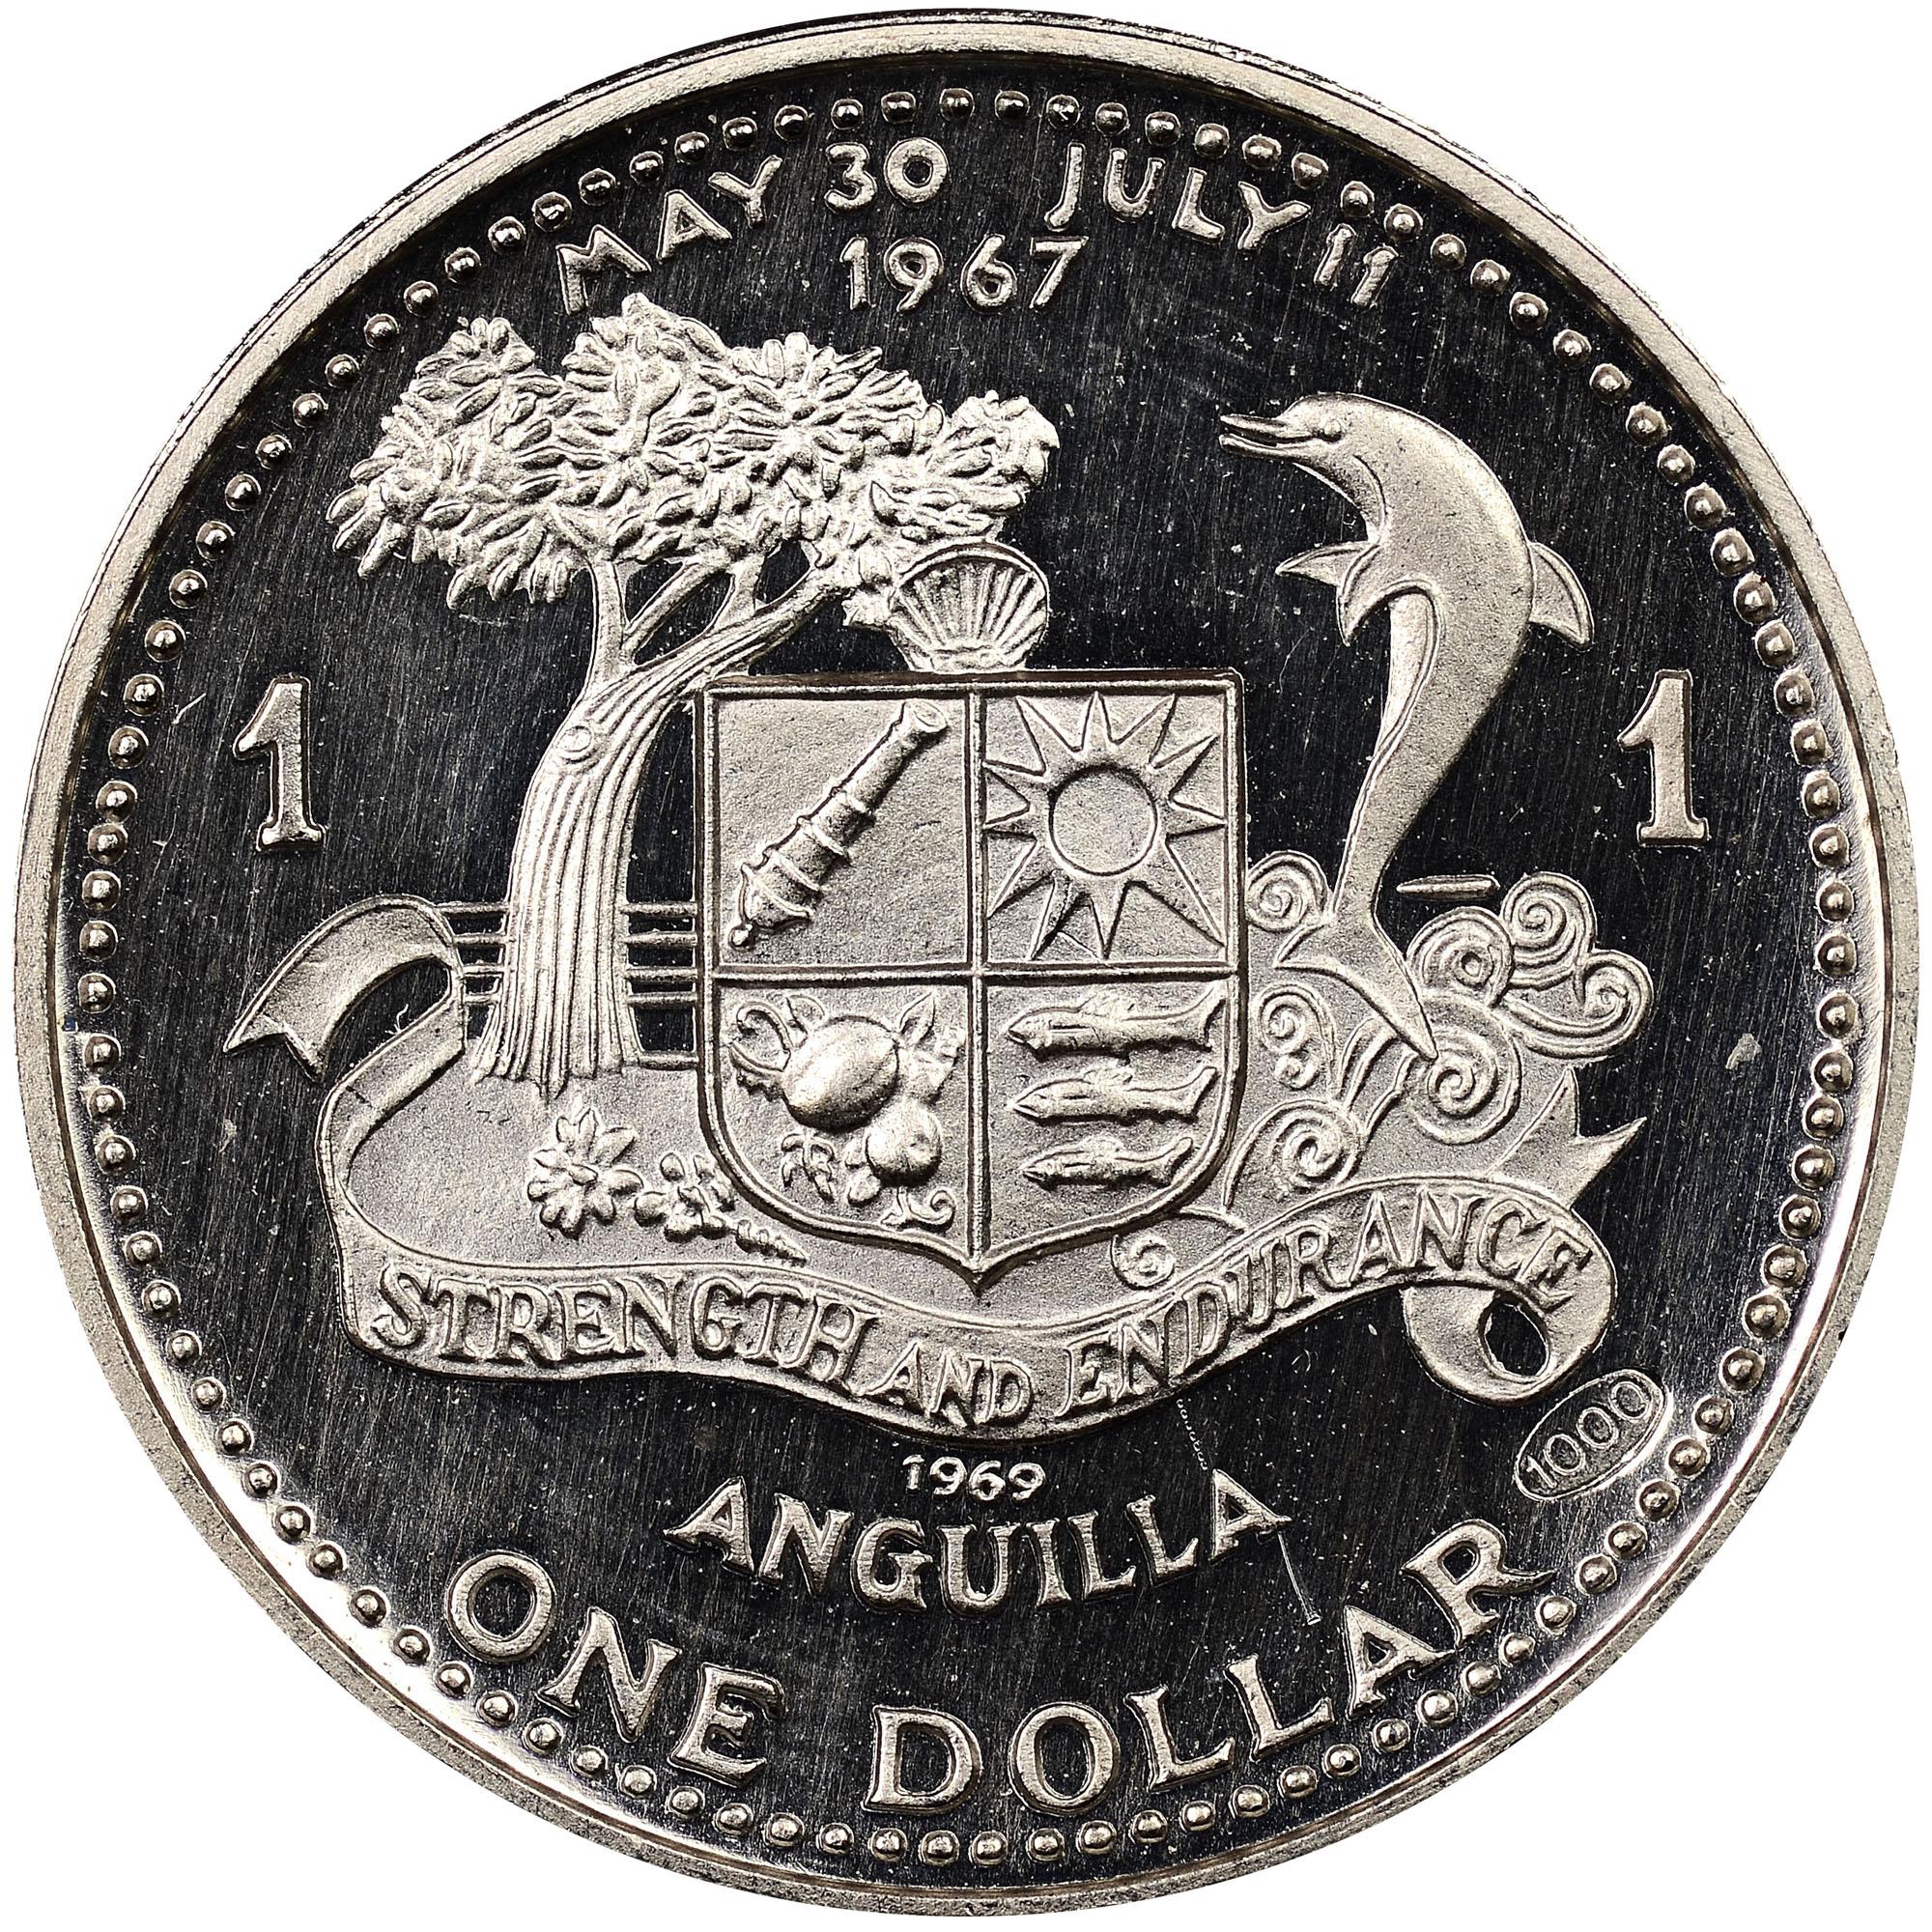 1969-ND Anguilla Dollar reverse